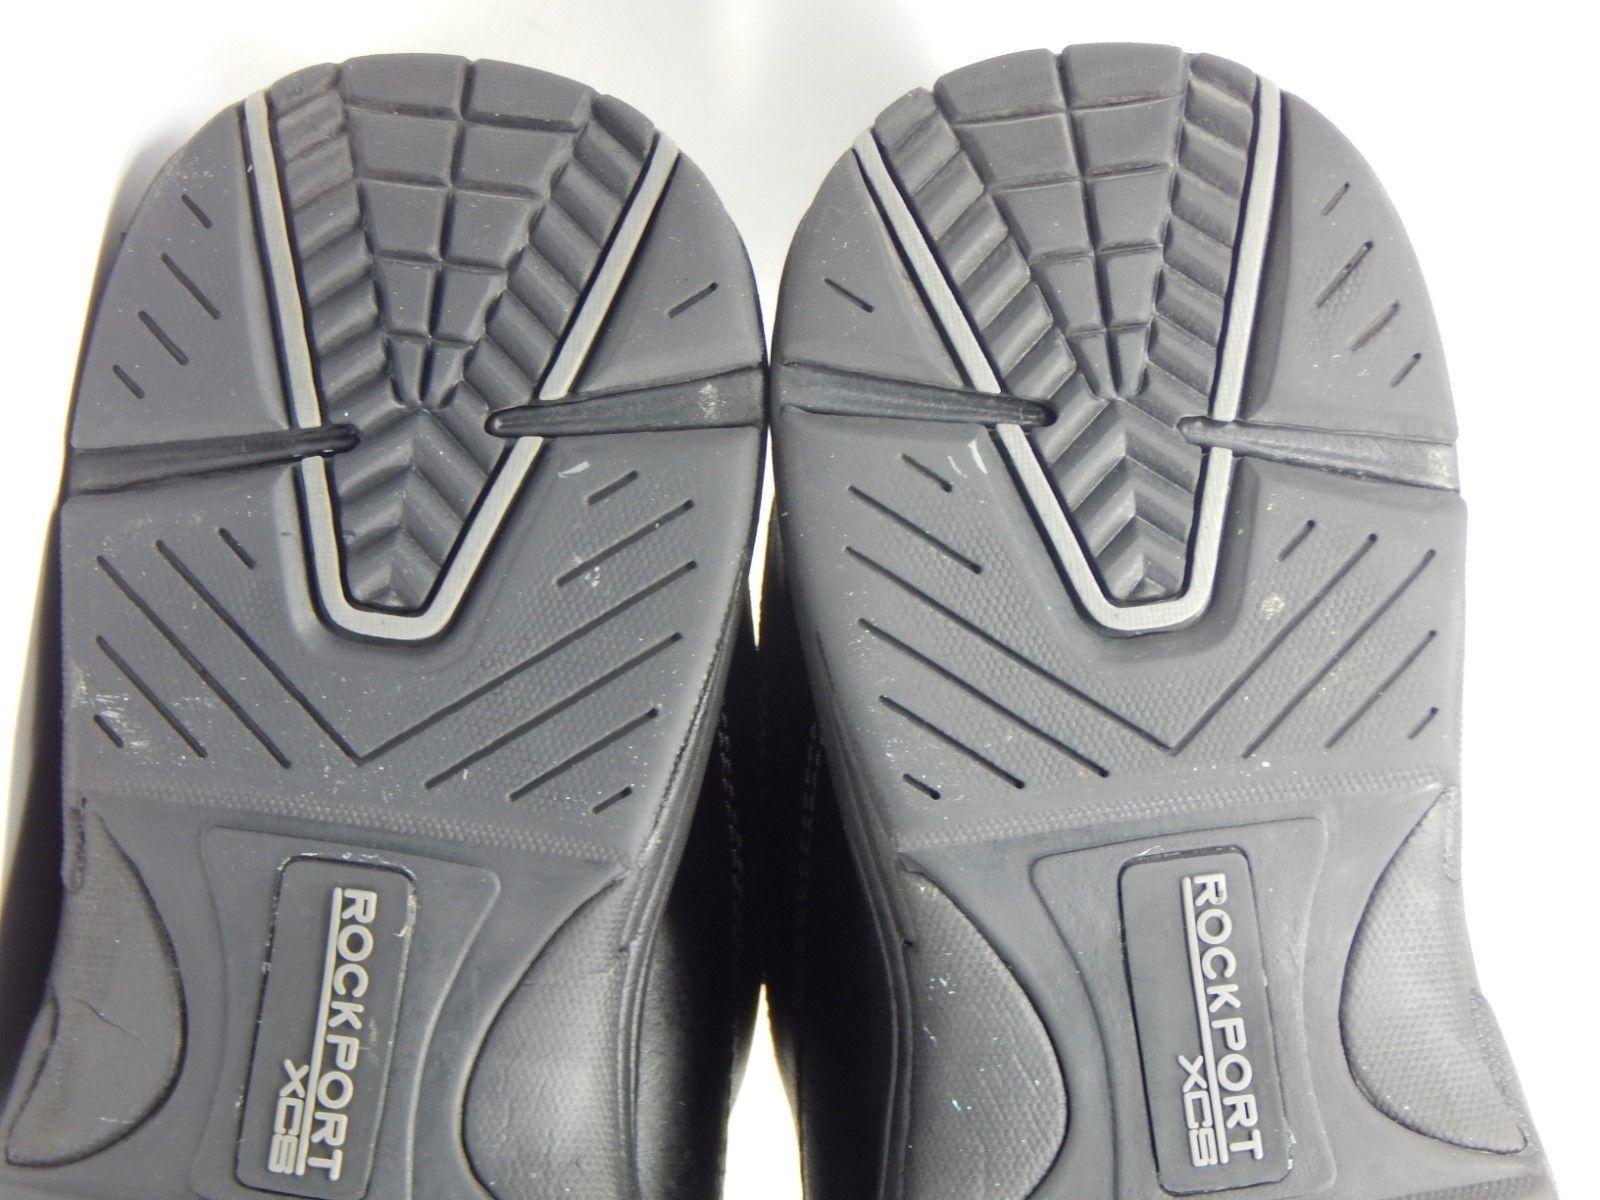 Rockport We are Rockin Chranson Size US 11 M EU 45 Men's Leather Walking Shoes